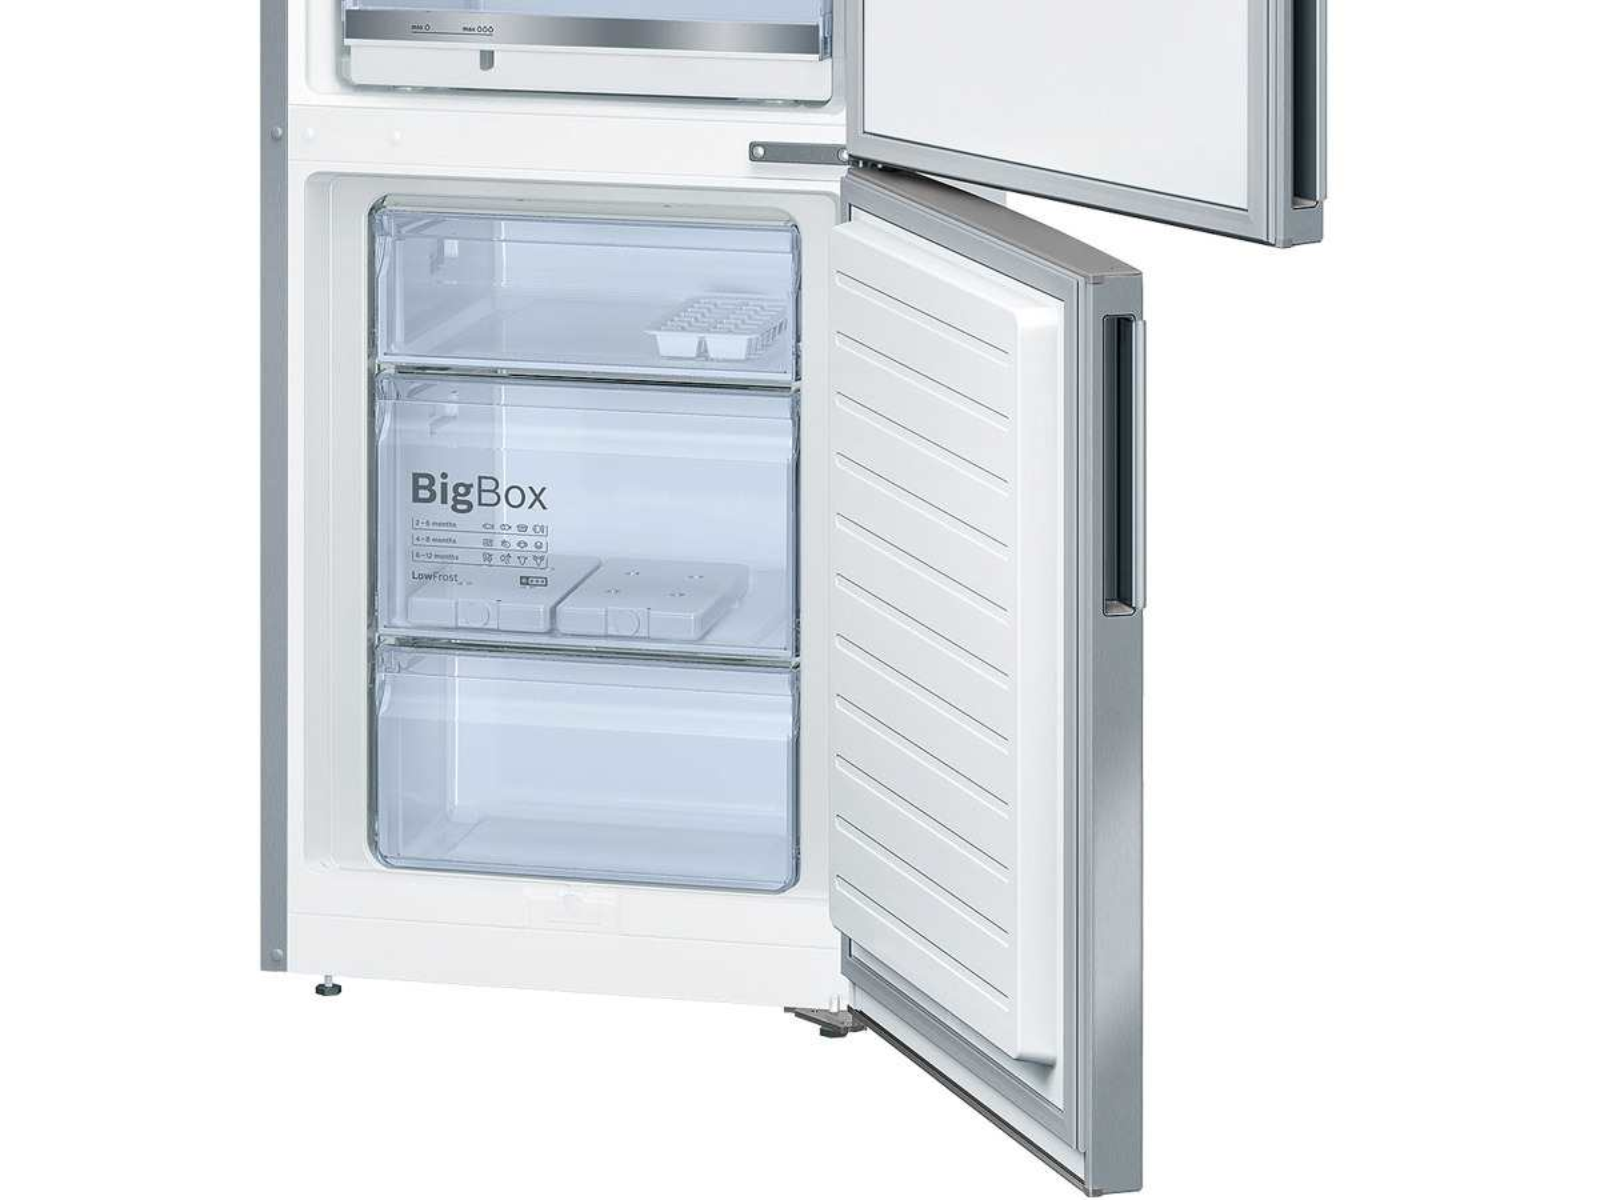 Kühlschrank Kombi : Kühlschrank kombi aeg sce zc preisvergleich kühl gefrier kombi